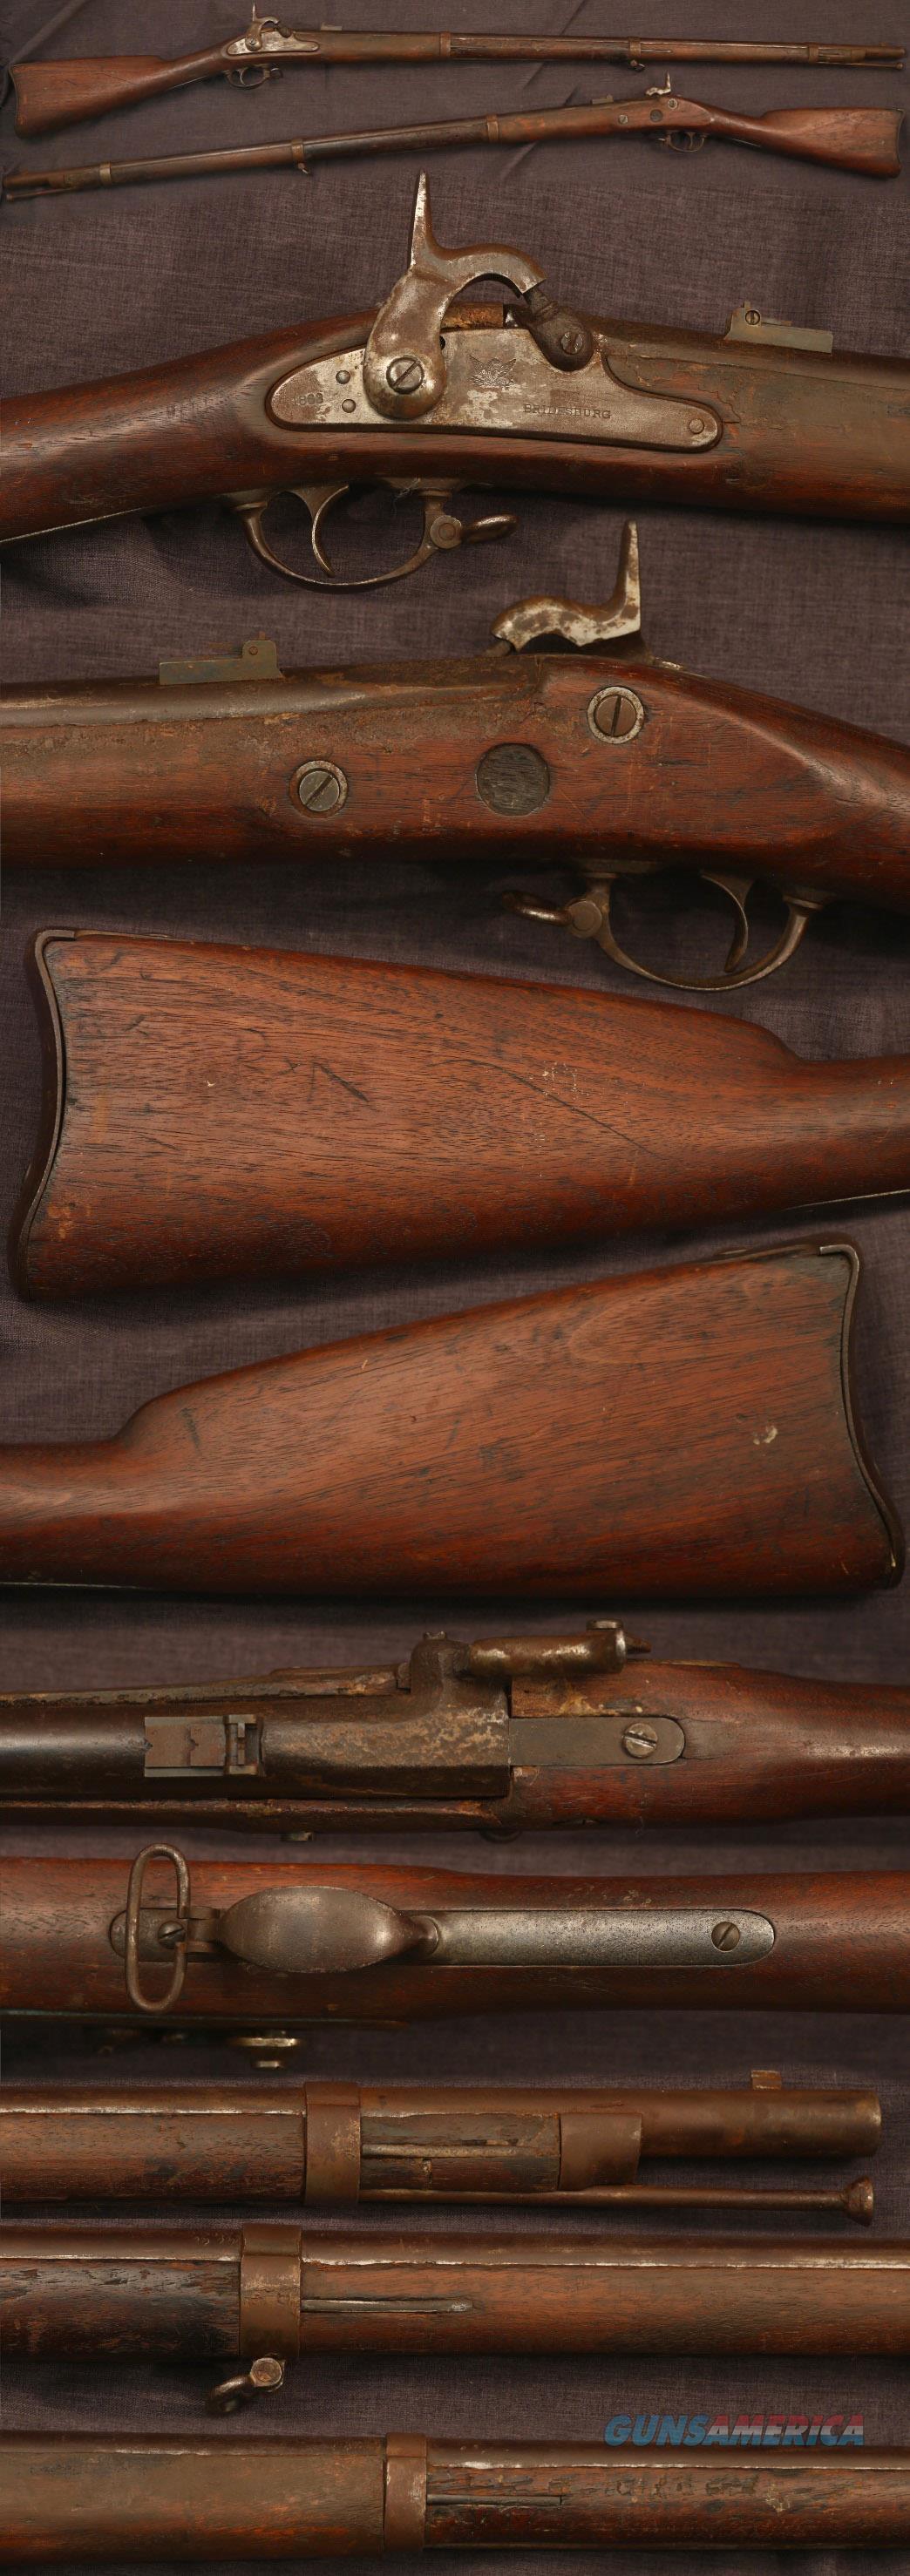 M1861 US Bridesburg contract musket, restored  Guns > Rifles > Muzzleloading Pre-1899 Rifles (perc)